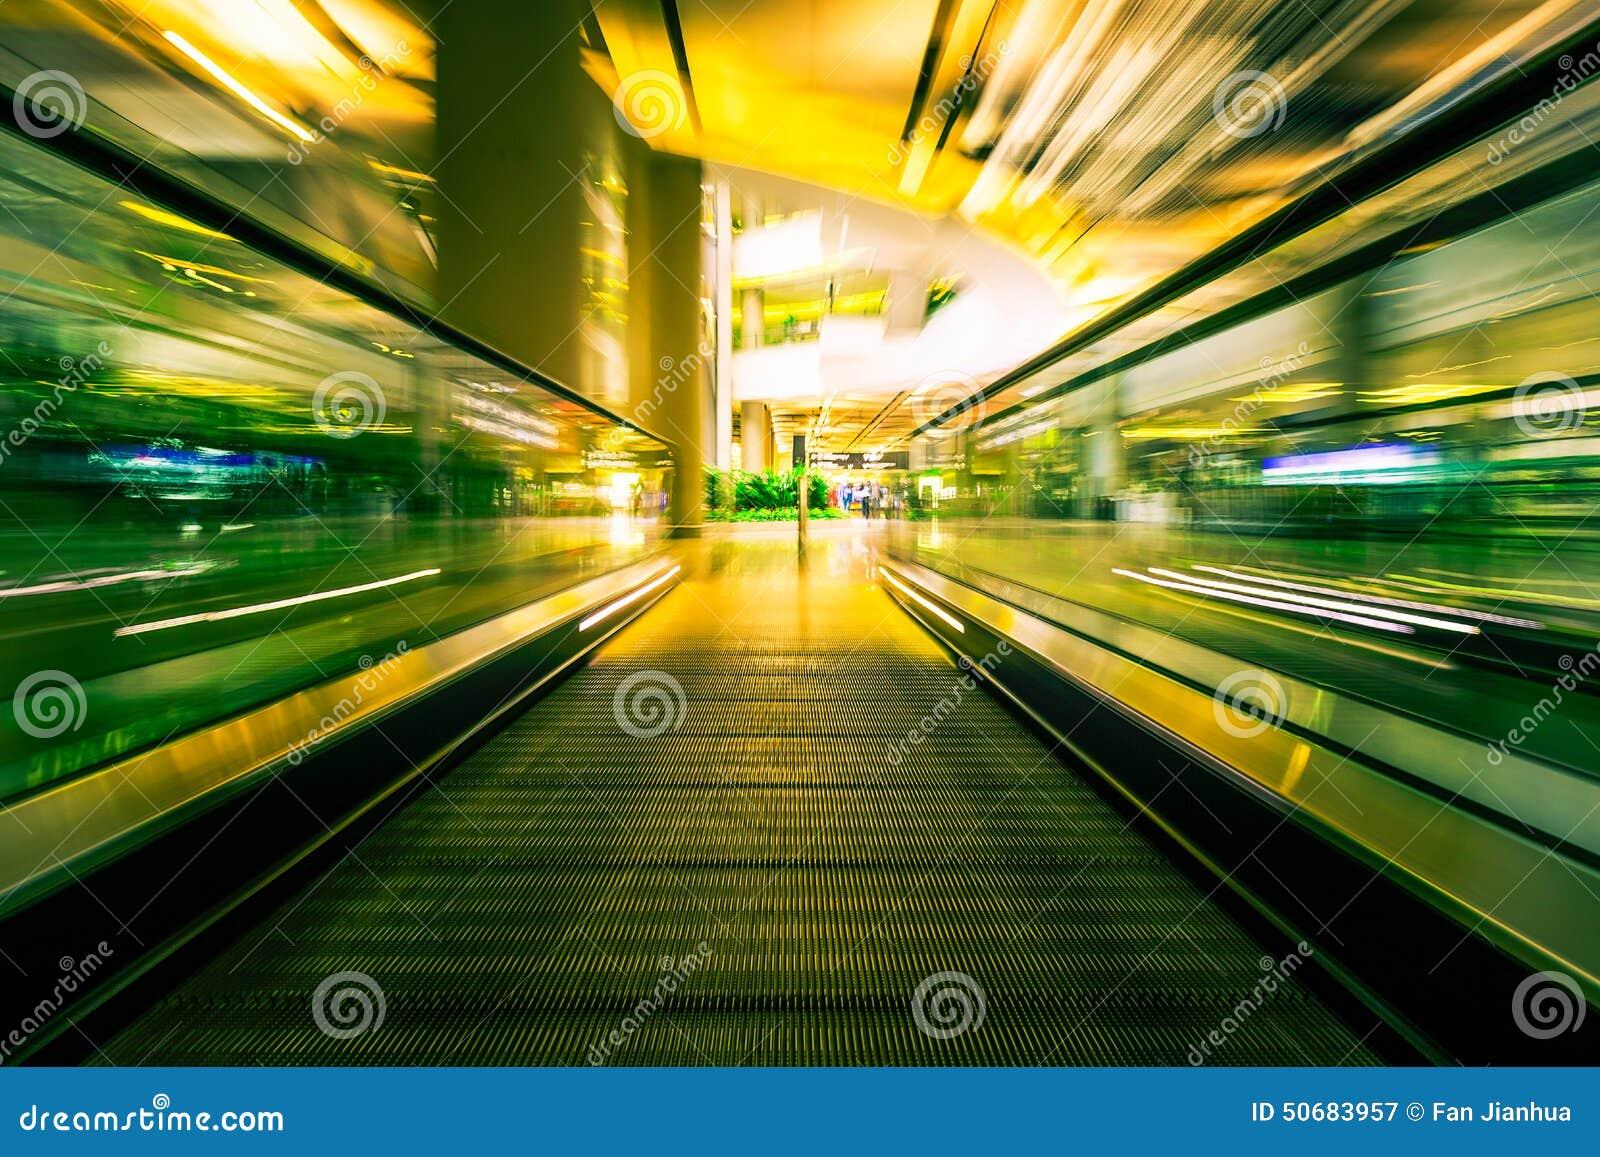 Download 机场隧道和步行者 库存图片. 图片 包括有 模糊, 迅速地, 步幅, 休闲, 建筑, 旅游业, alamos - 50683957